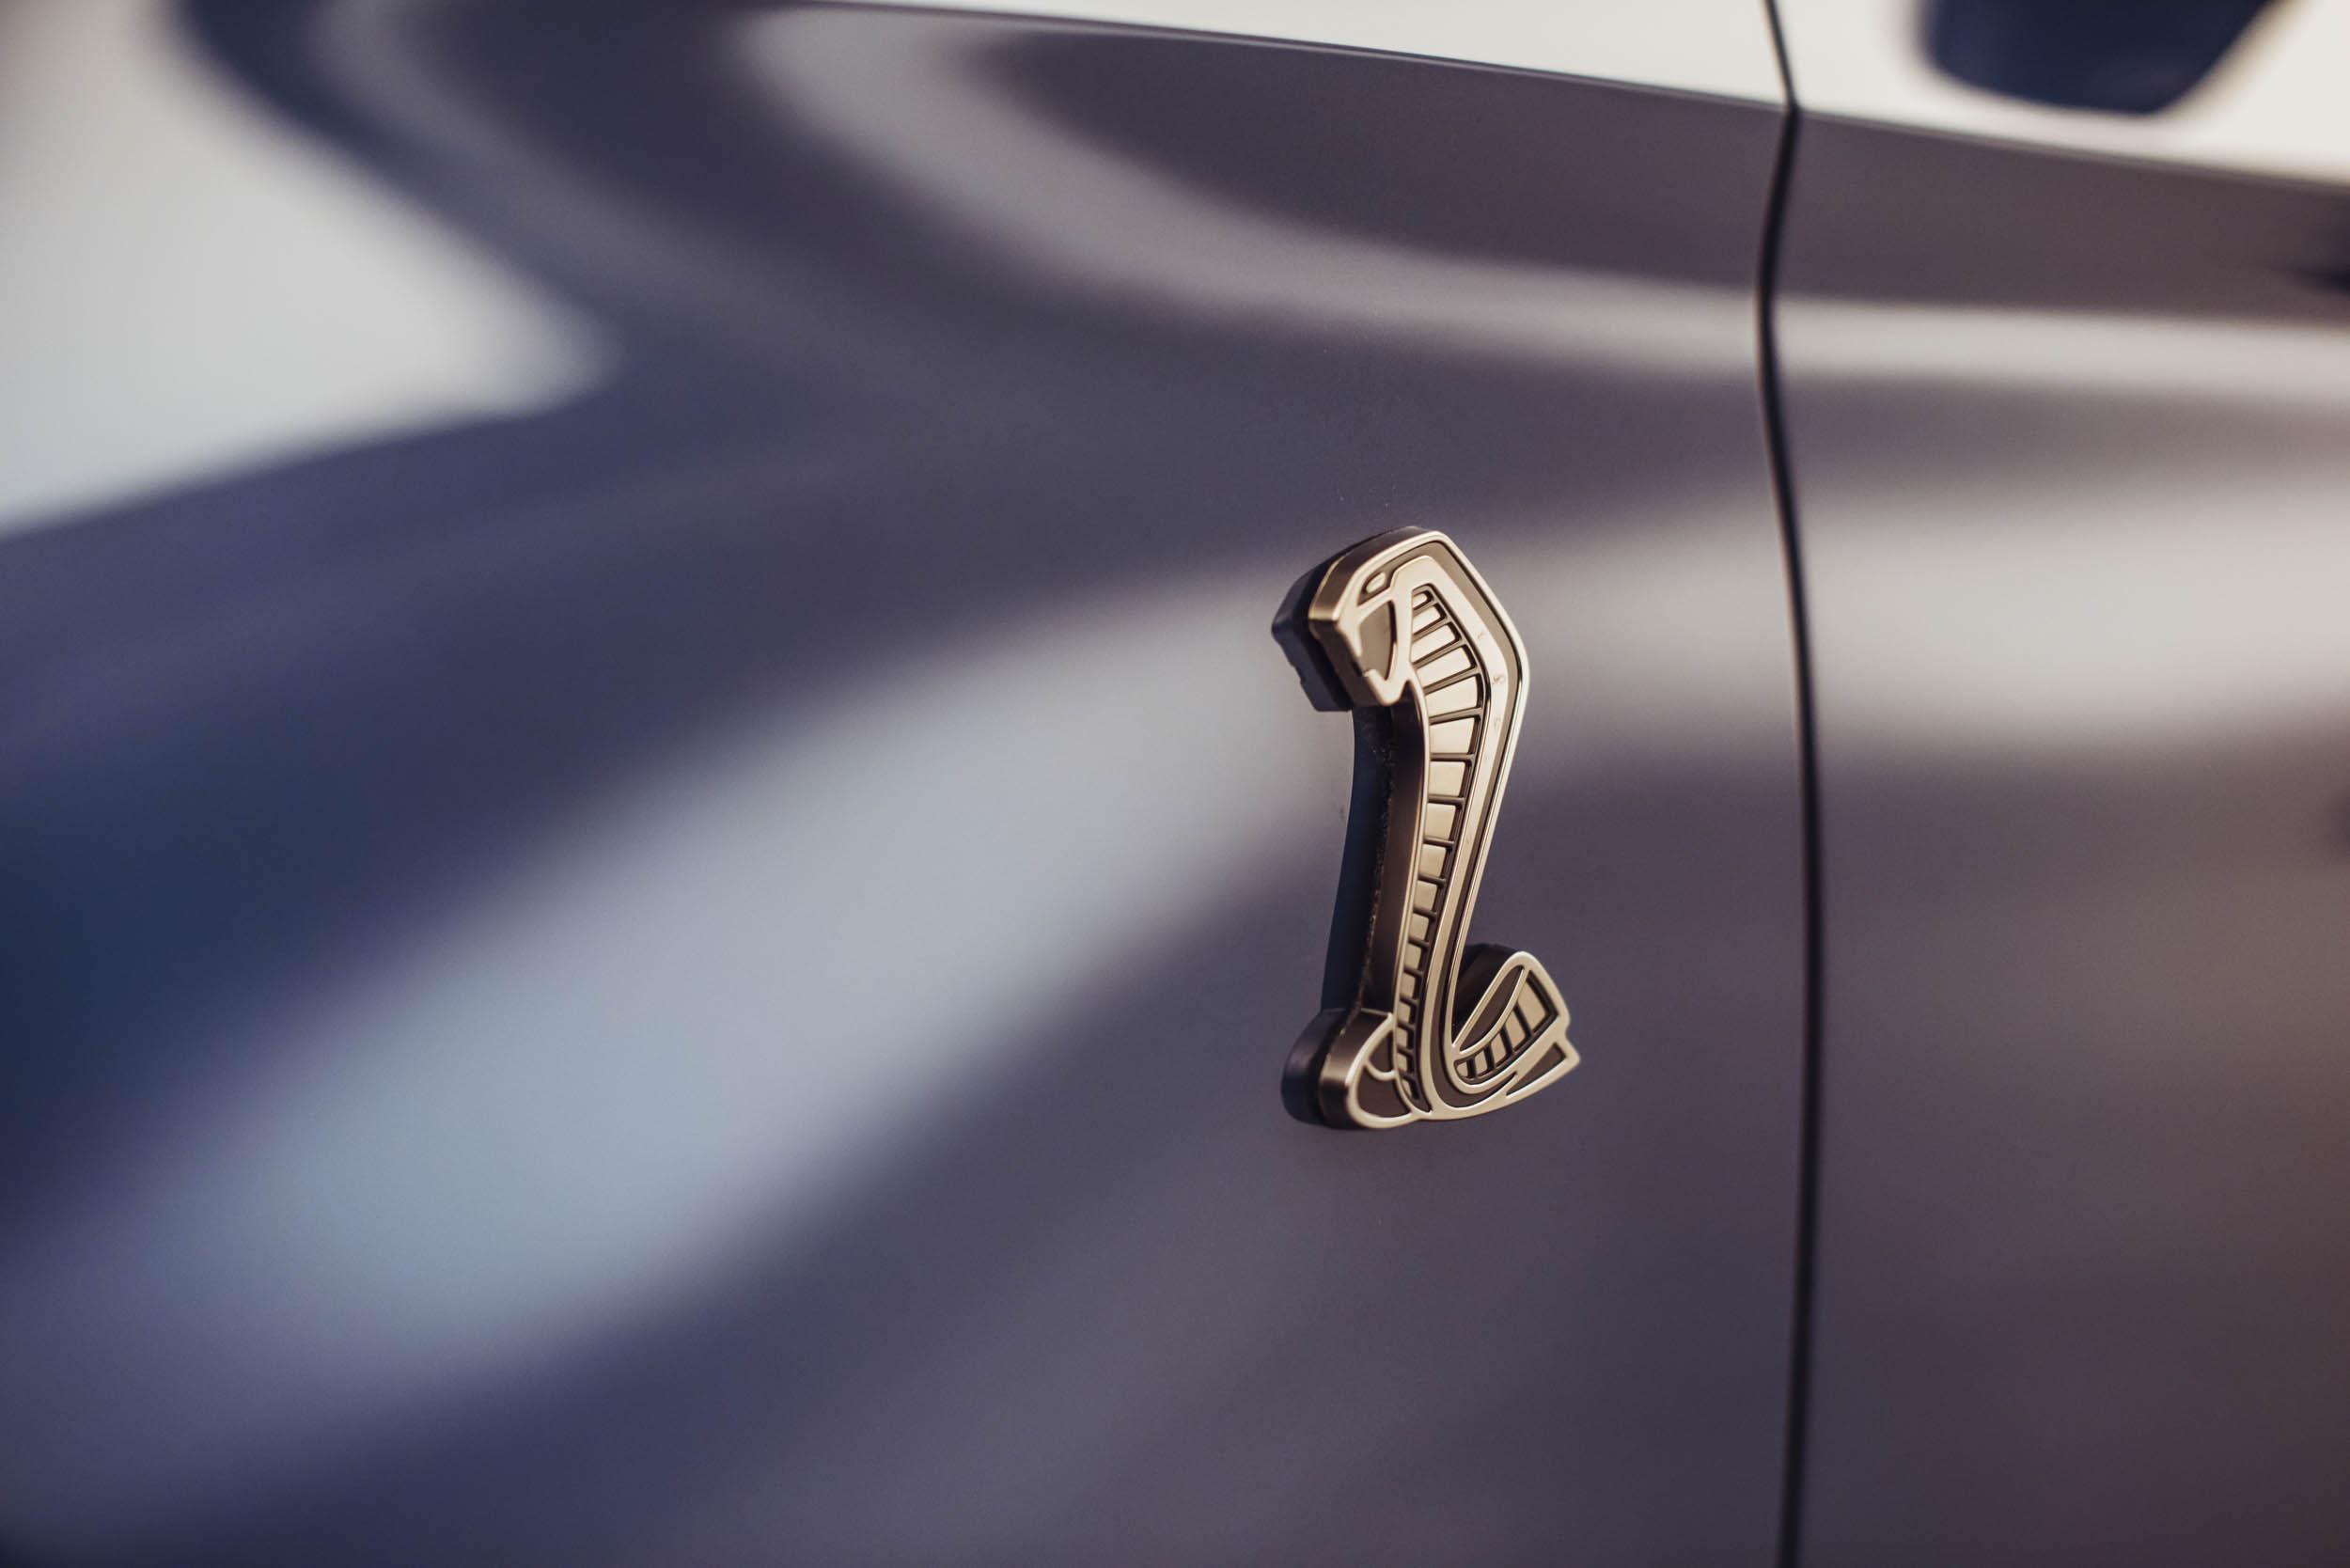 2020 Shelby GT500 snake badge